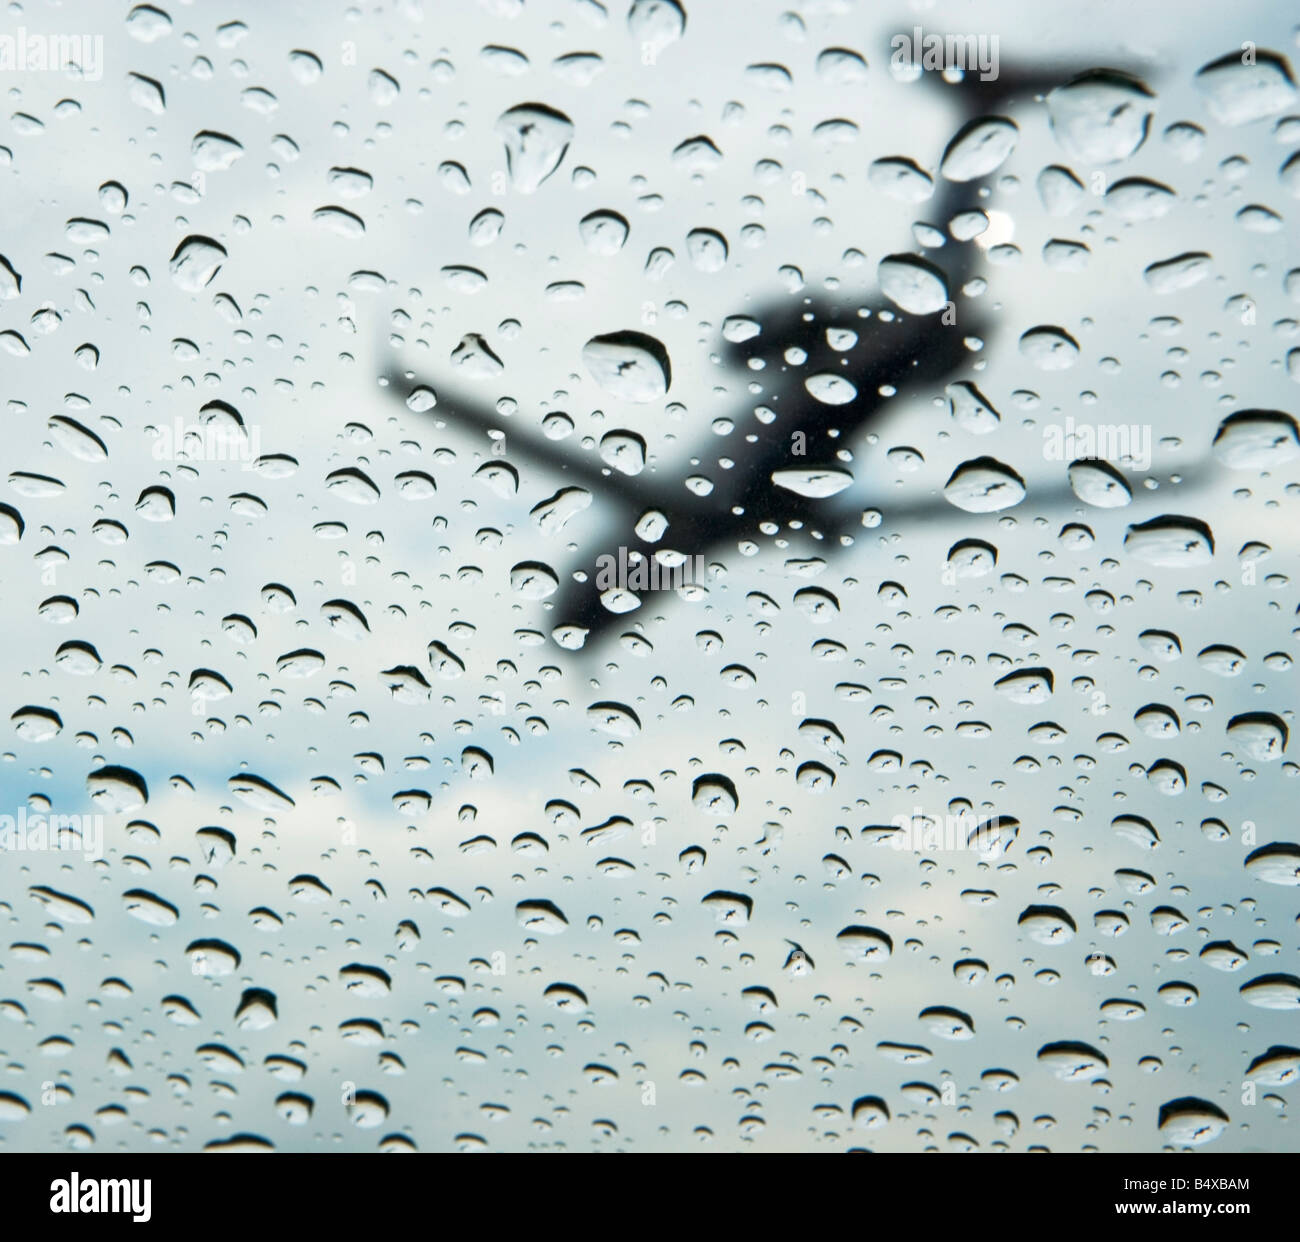 Window Frame And Rain Stock Photos & Window Frame And Rain Stock ...